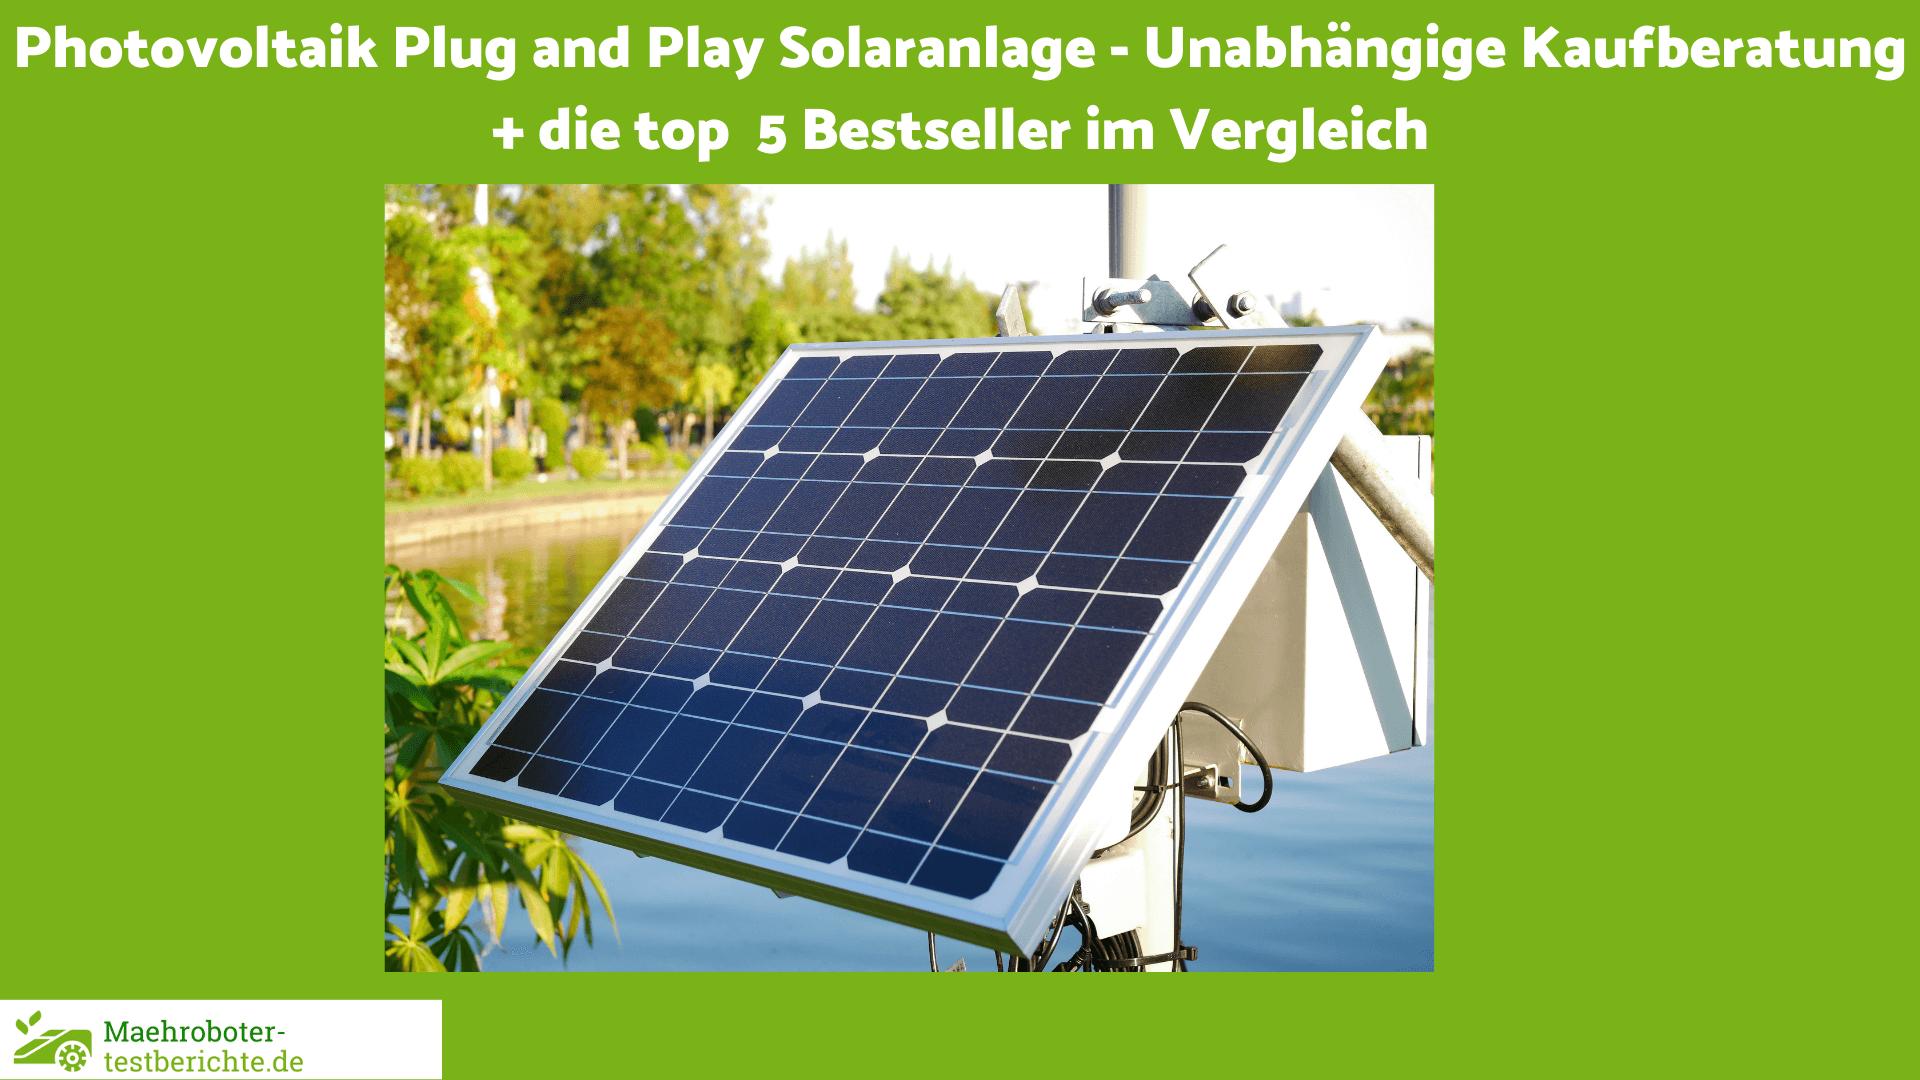 Photovoltaik Plug and Play Solaranlage Test